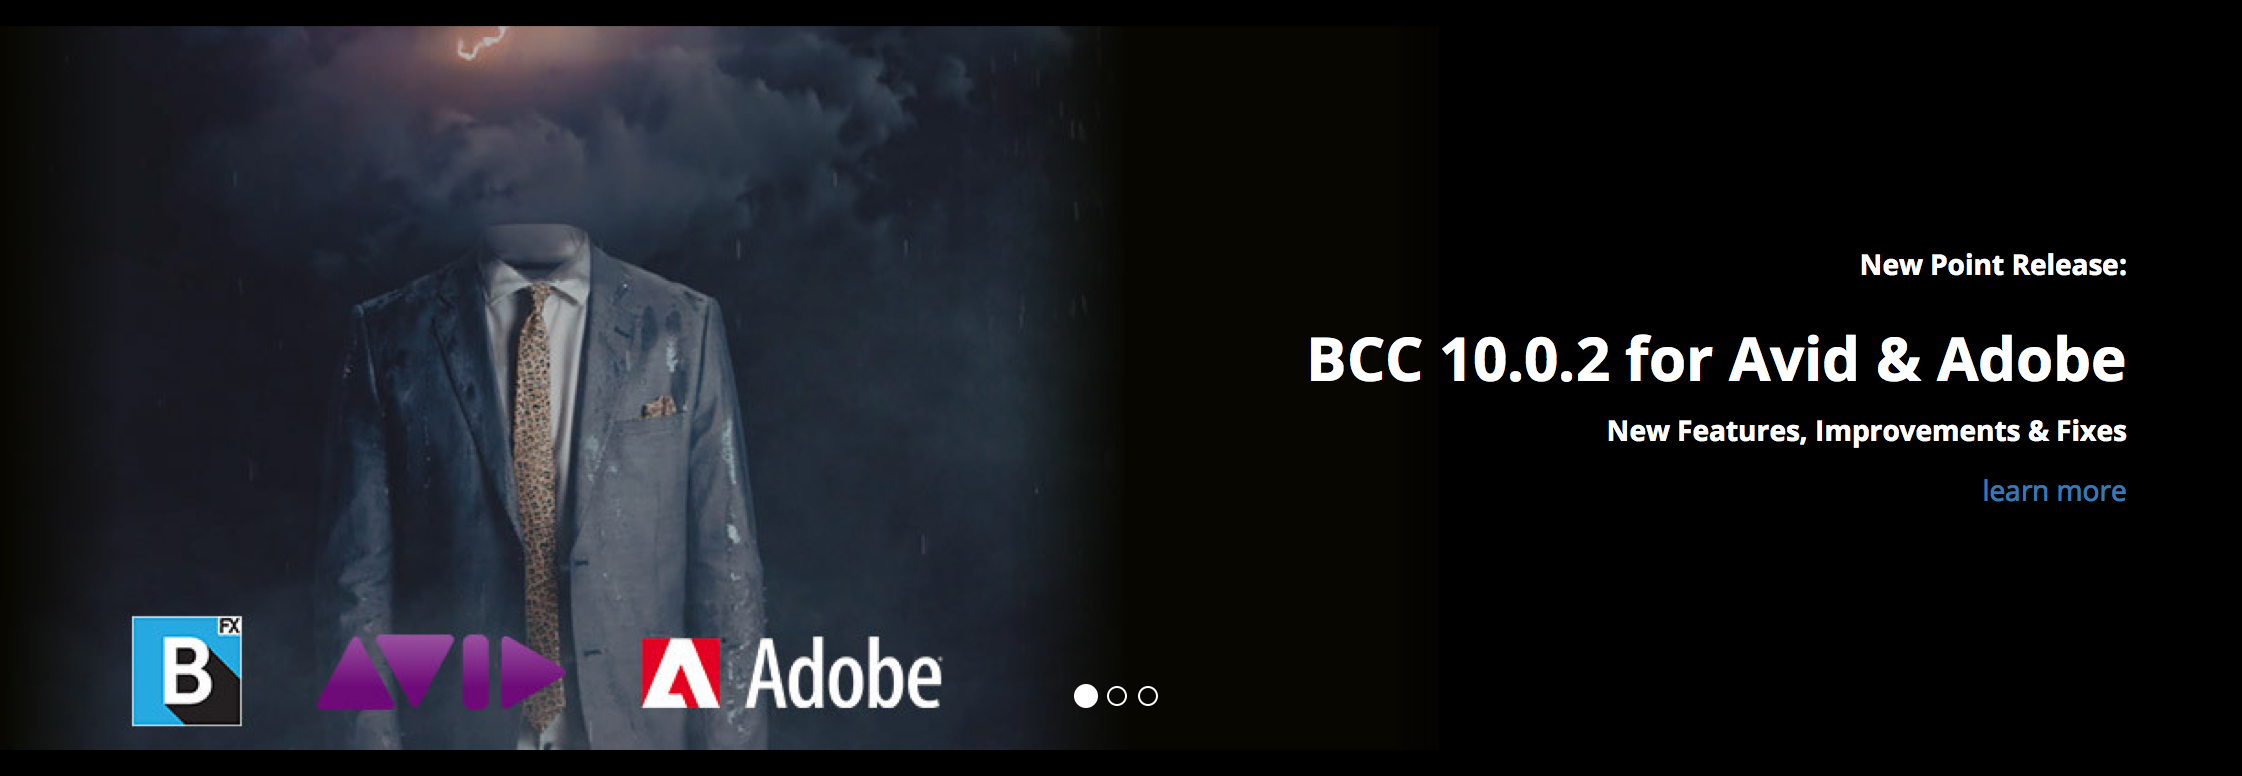 bcc-10-2-boris-fx